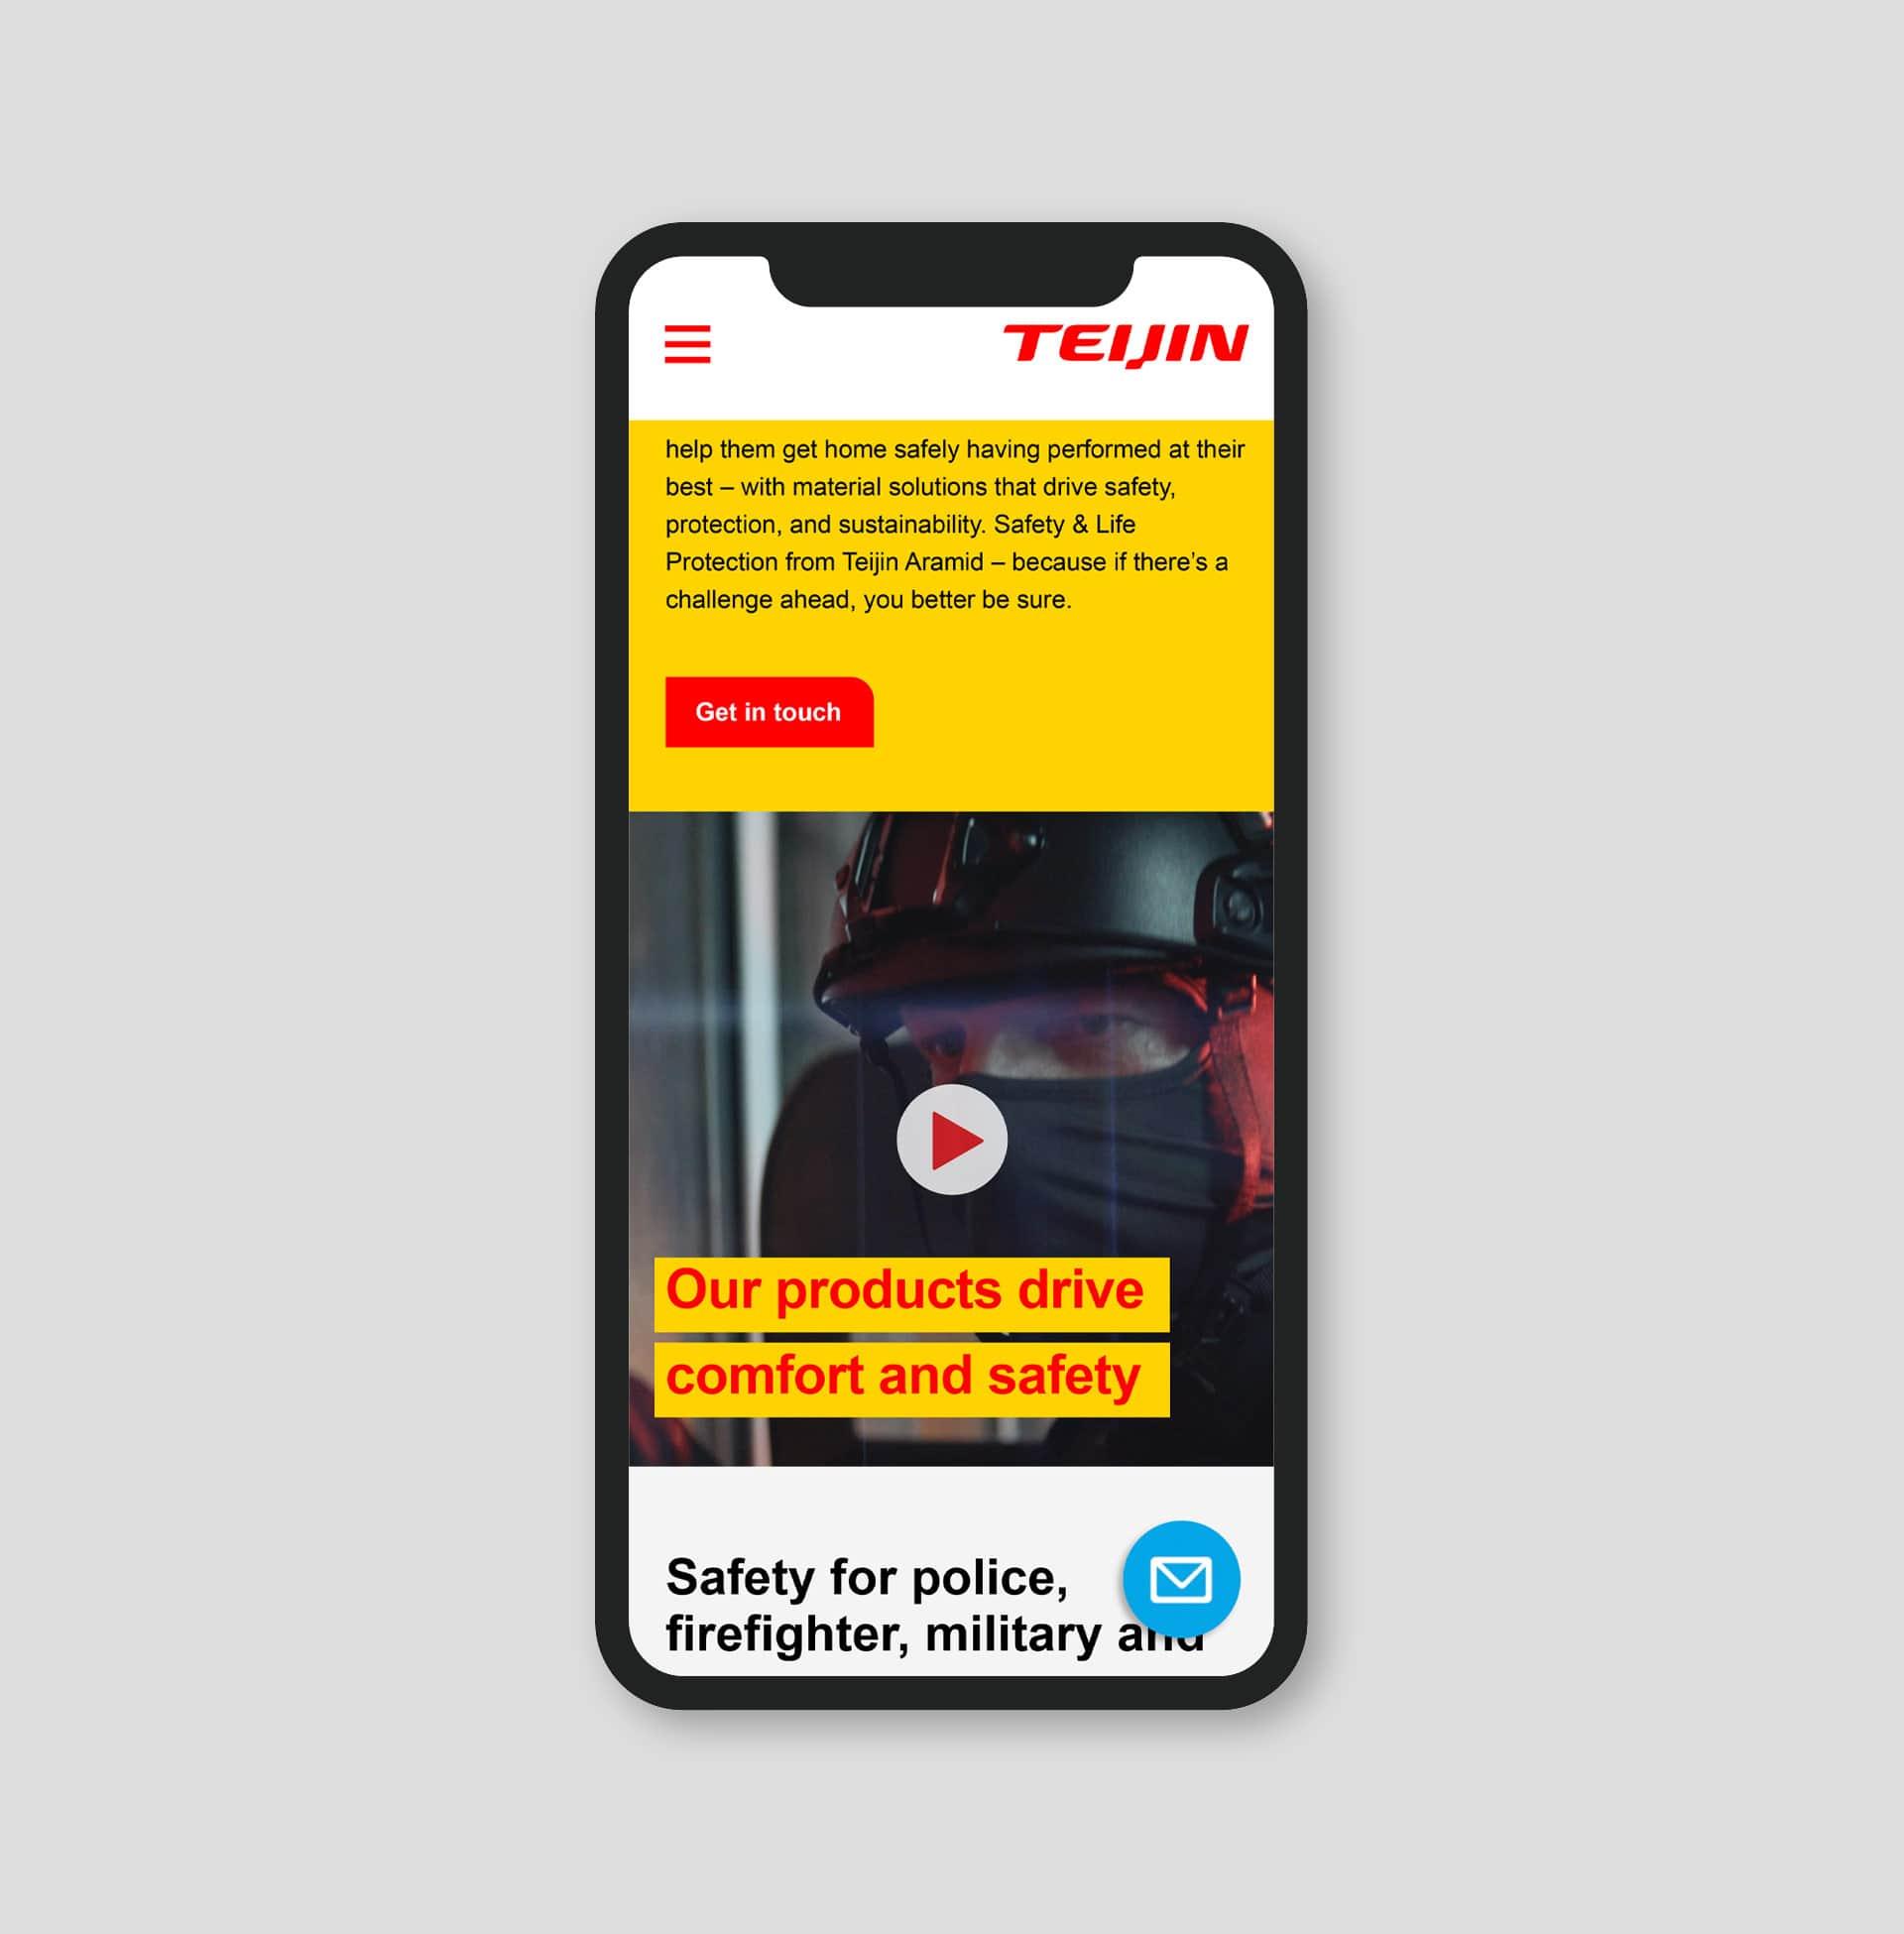 Landingspagina op mobiel van de campagne Safety & Life protection van Teijin Aramid